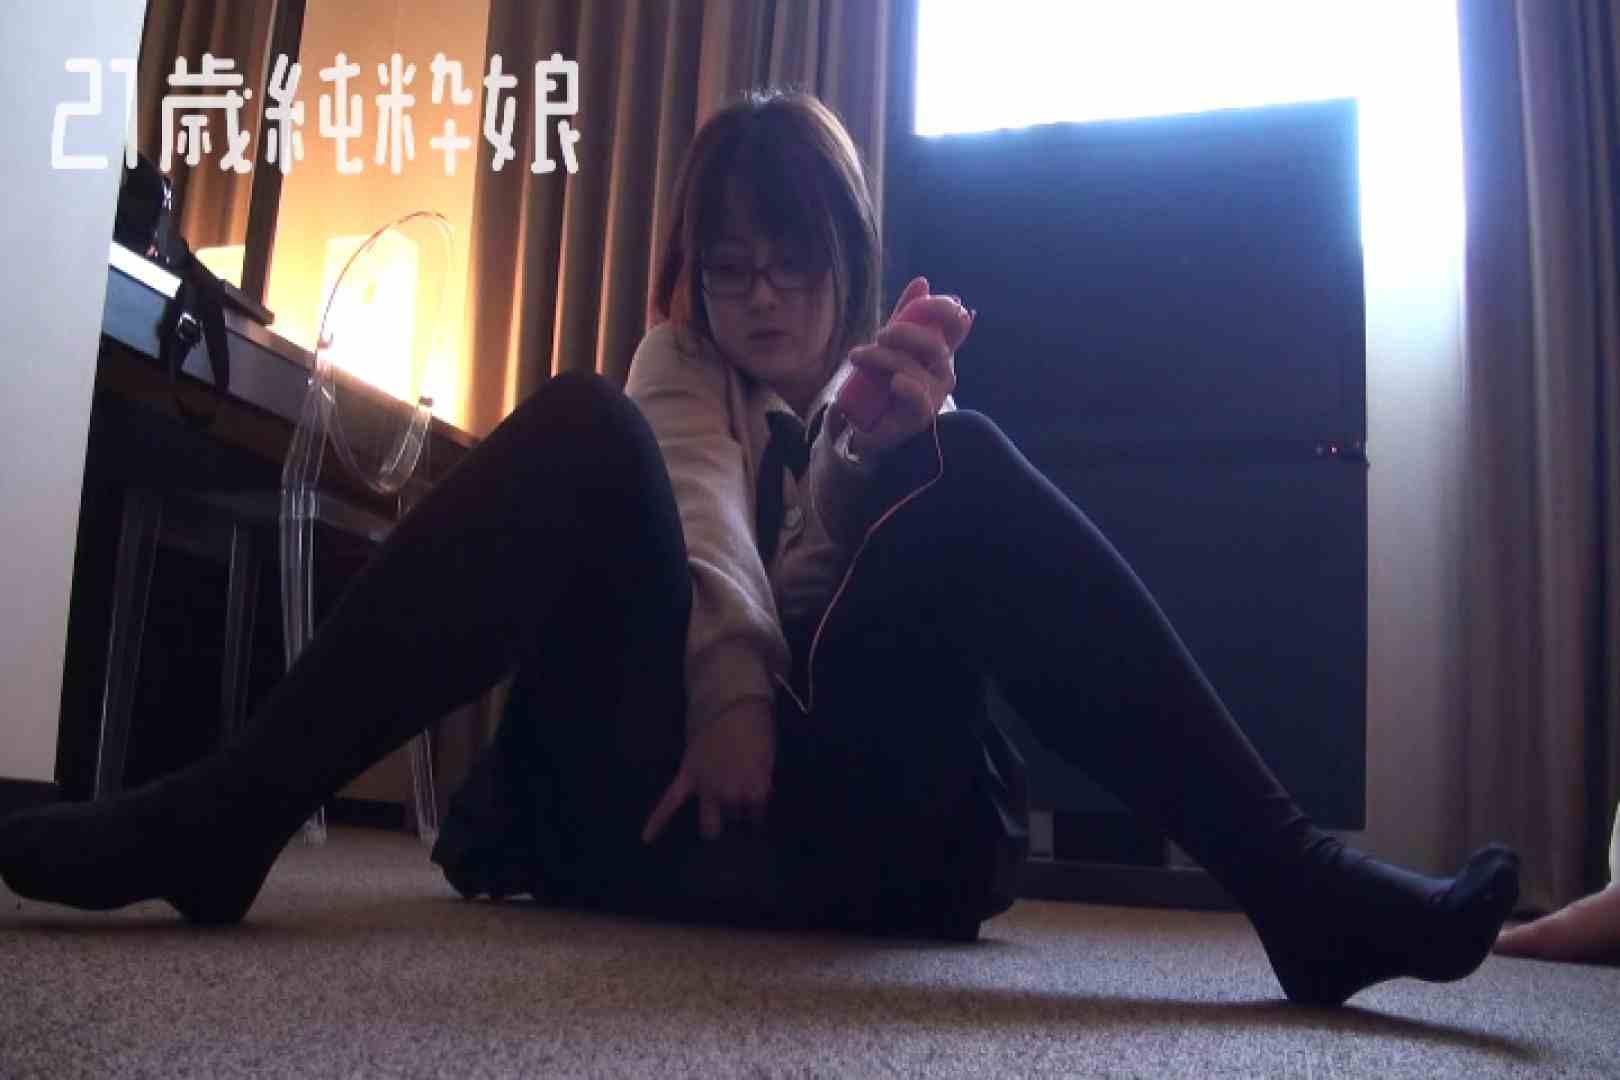 Gカップ21歳純粋嬢第2弾Vol.3 エッチなOL | 学校  50pic 1